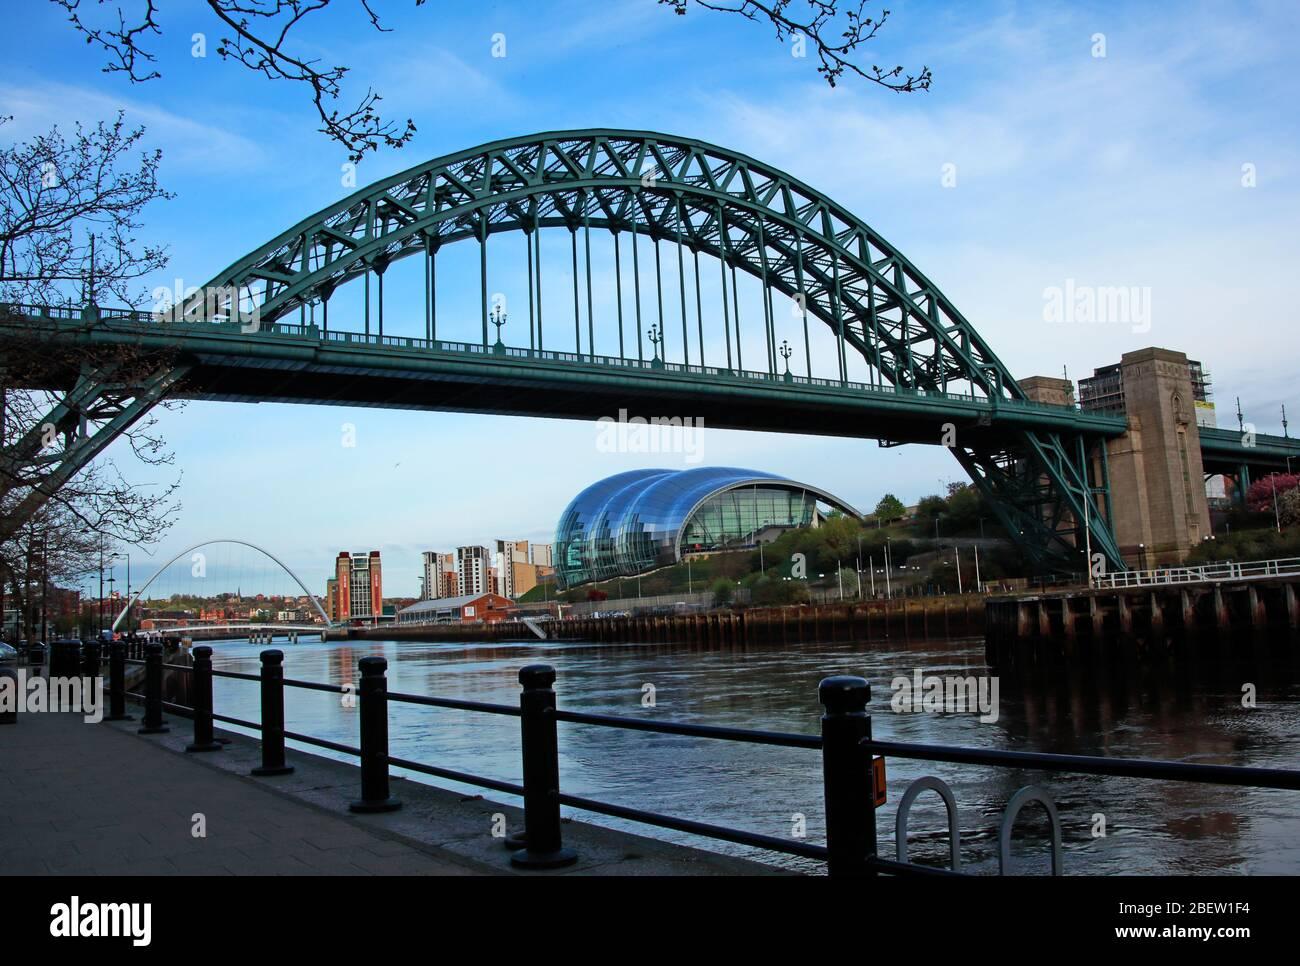 GoTonySmith,@HotpixUK,HotpixUK,river,riverside,water,city,North East,England,Geordie,Tyne River,Newcaste upon Tyne,evening,UK,Tyne,River,Newcaste,upon Tyne,Gateshead,Sage,NE,bridge,river side,economy,Tyneside conurbation,Tyne bridge,spring,NE1,River Tyne Quayside,Quayside,through arch bridge,arch bridge,Newcastle upon Tyne and Gateshead,linking,Mott,Hay and Anderson,Dorman Long and Co. of Middlesbrough